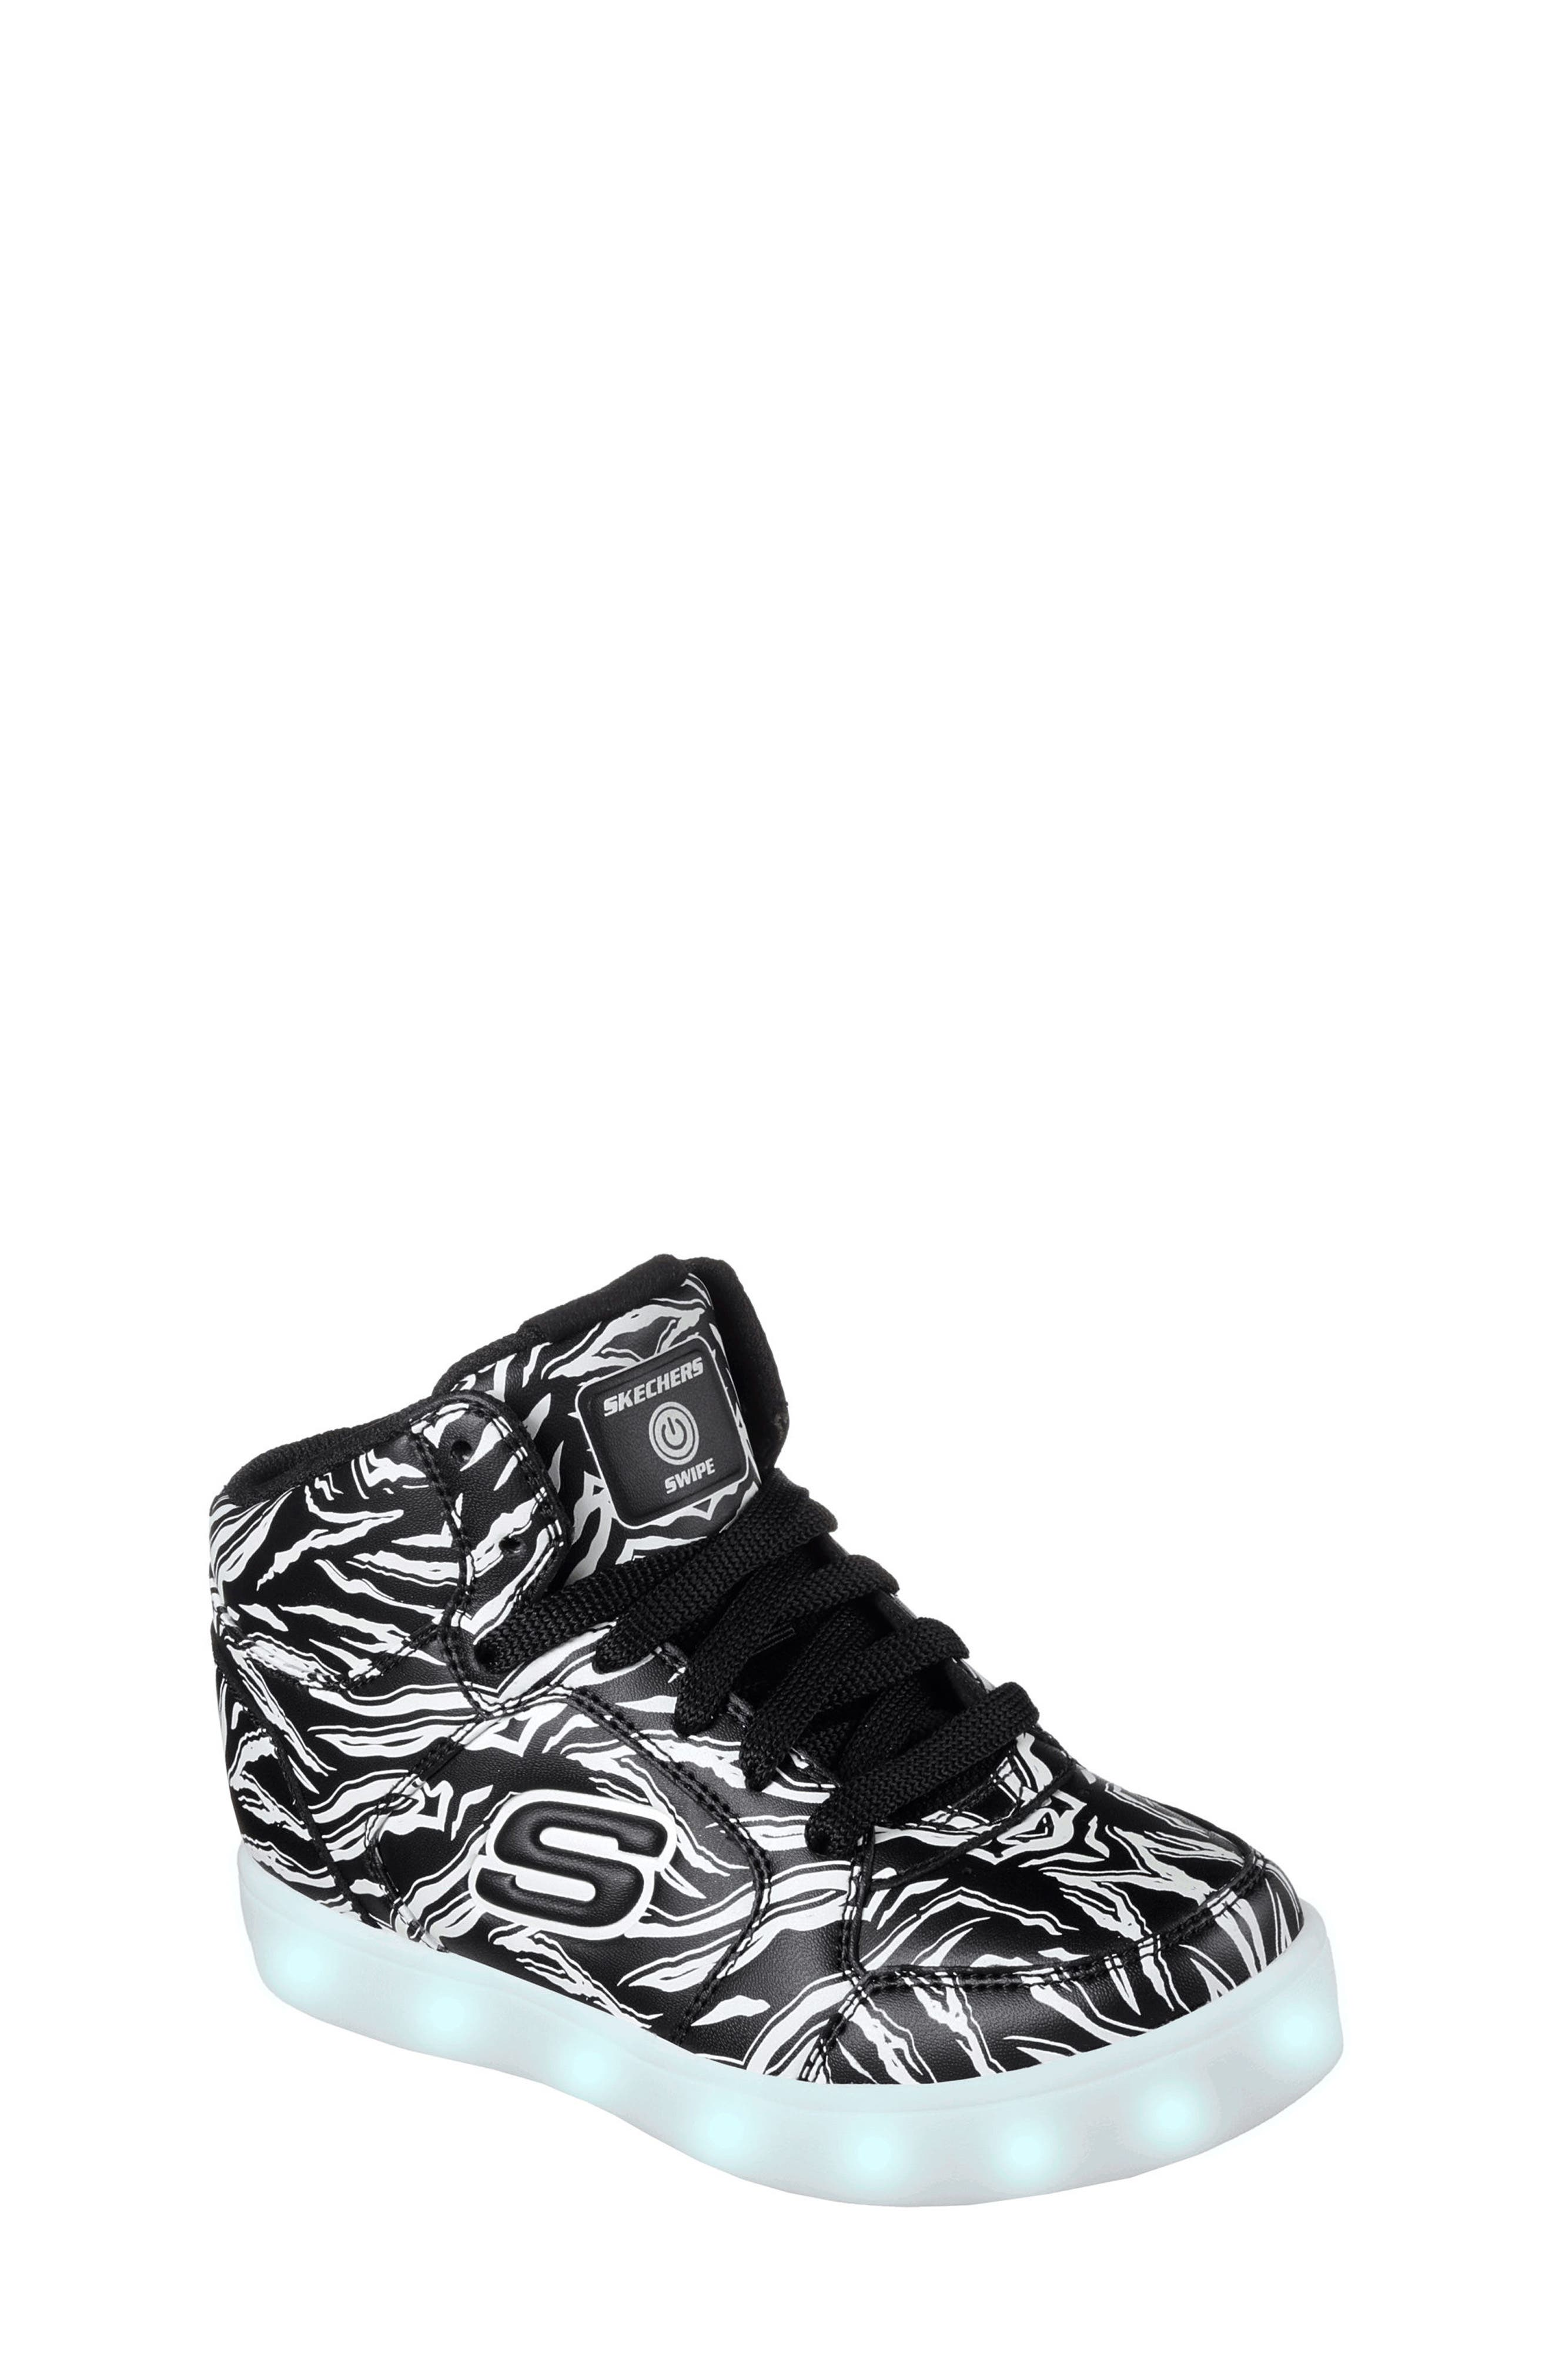 Energy Lights Glow in the Dark Sneaker,                             Alternate thumbnail 4, color,                             Black